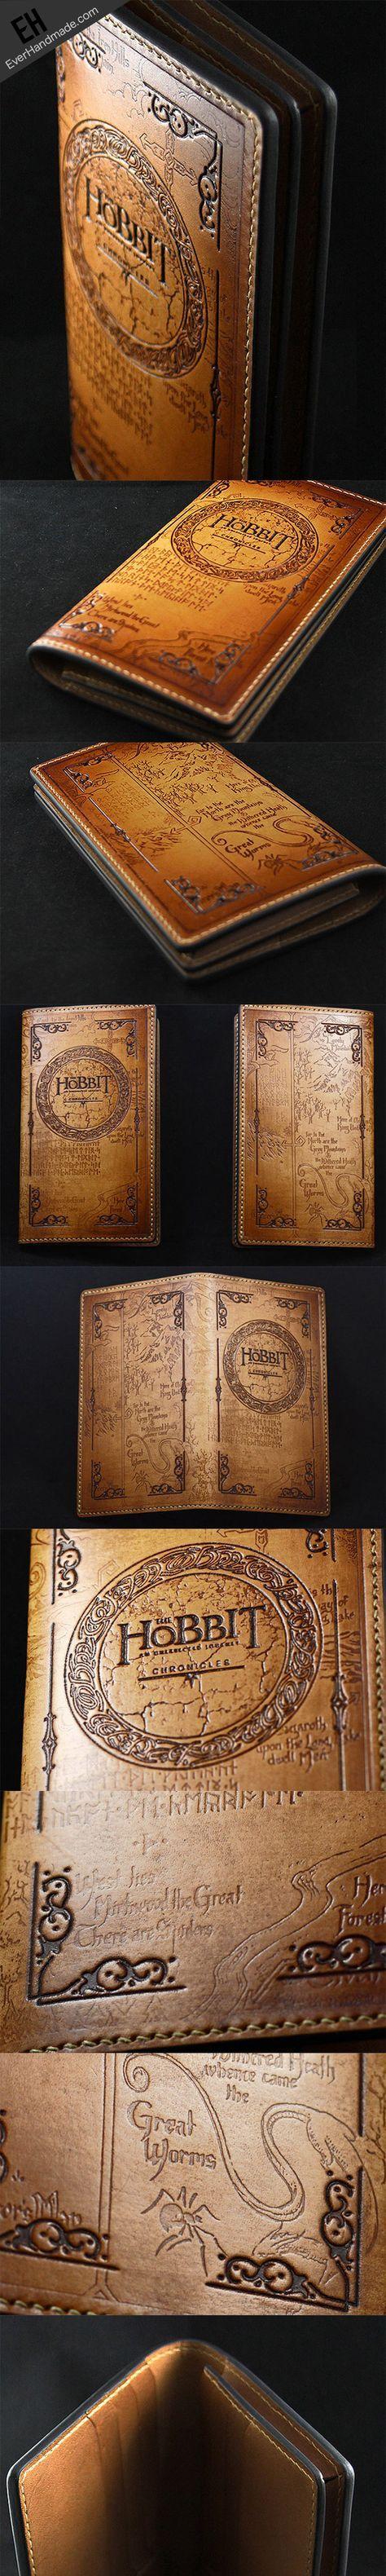 Handmade leather men wallet Hobbit carved leather custom long wallet w/card ID holder for men